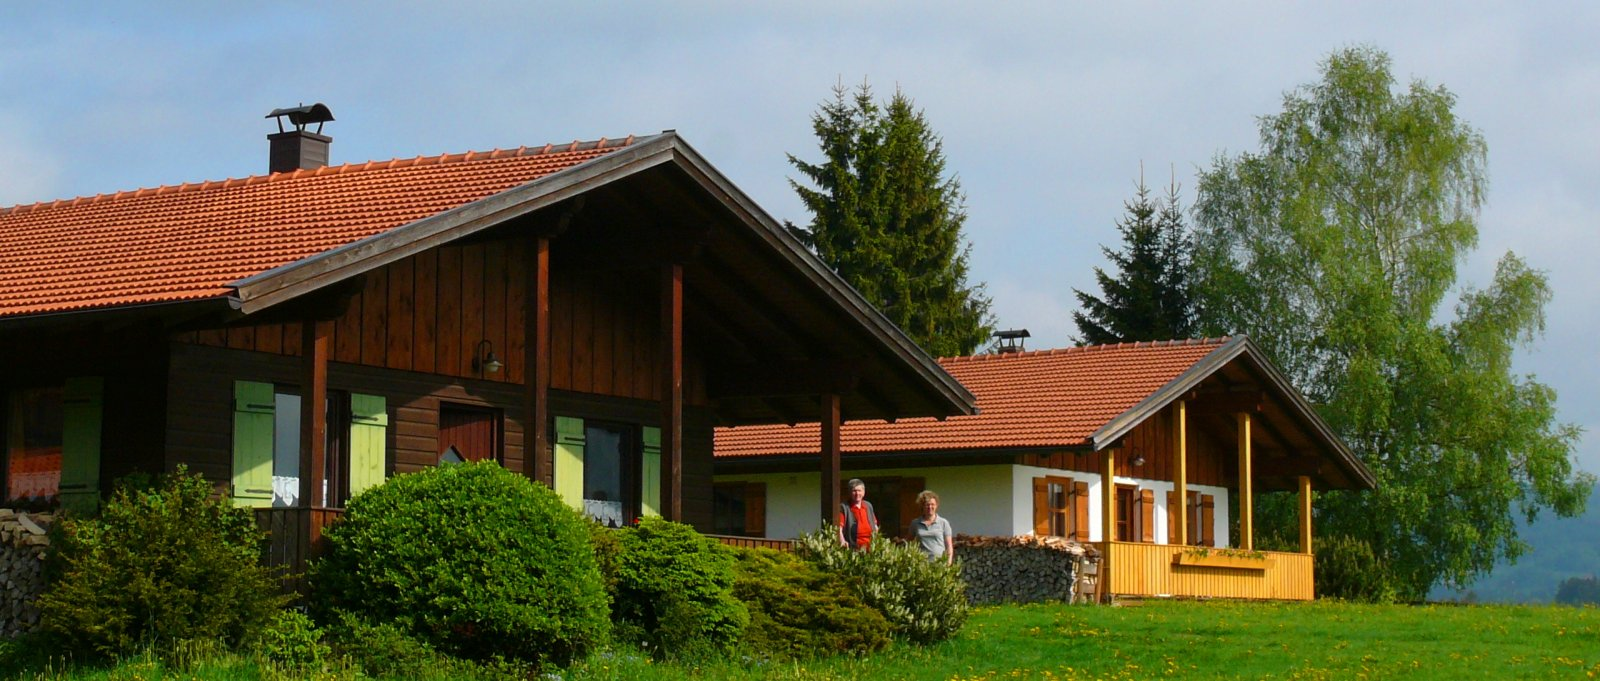 Ferienhütten Hirschhof Meier in Kirchdorf – Kontakt